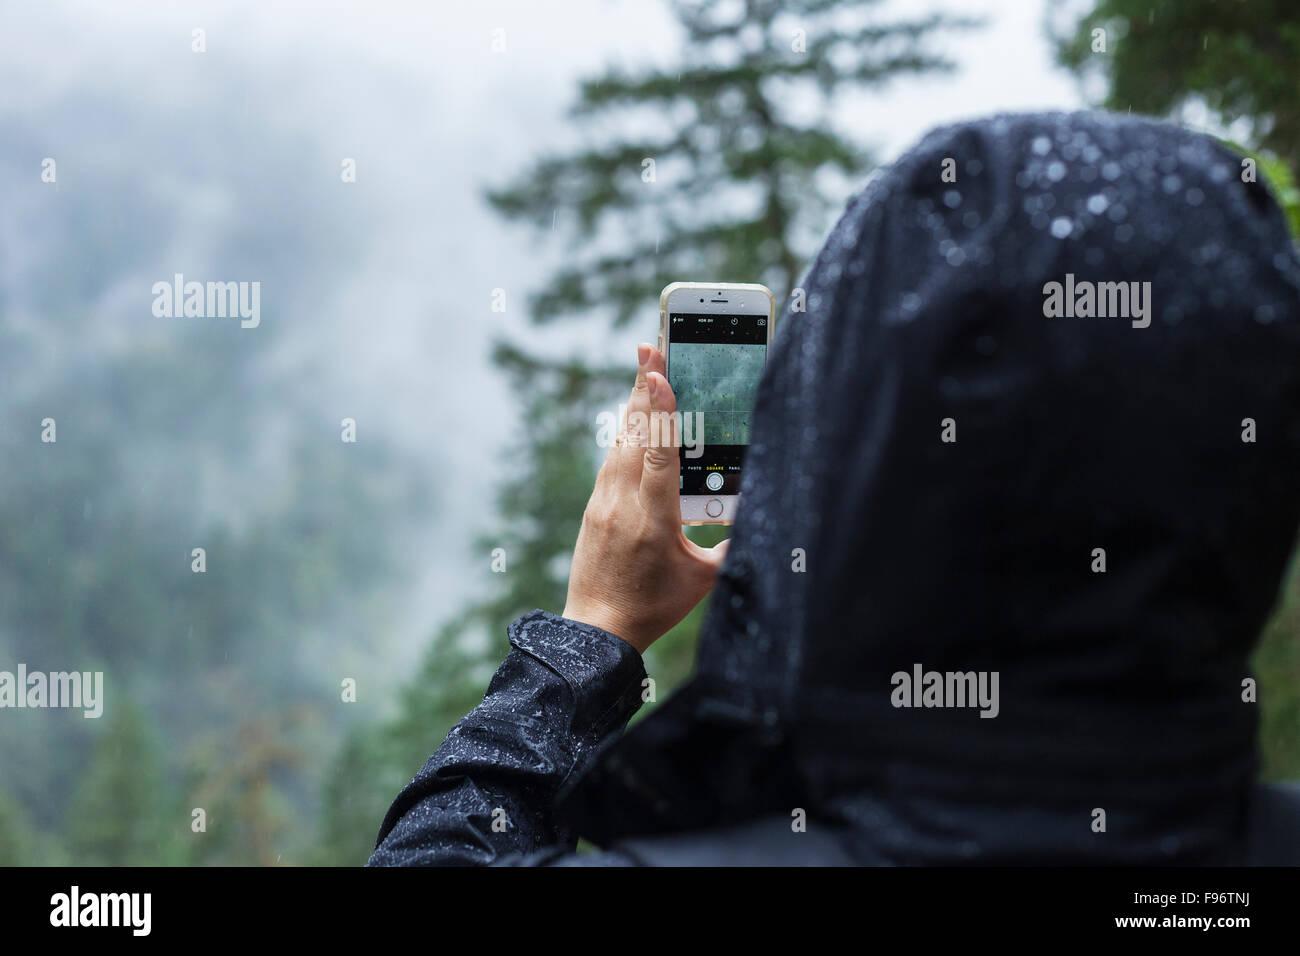 Frau nehmen Foto in den Regen, BC, Kanada Stockfoto